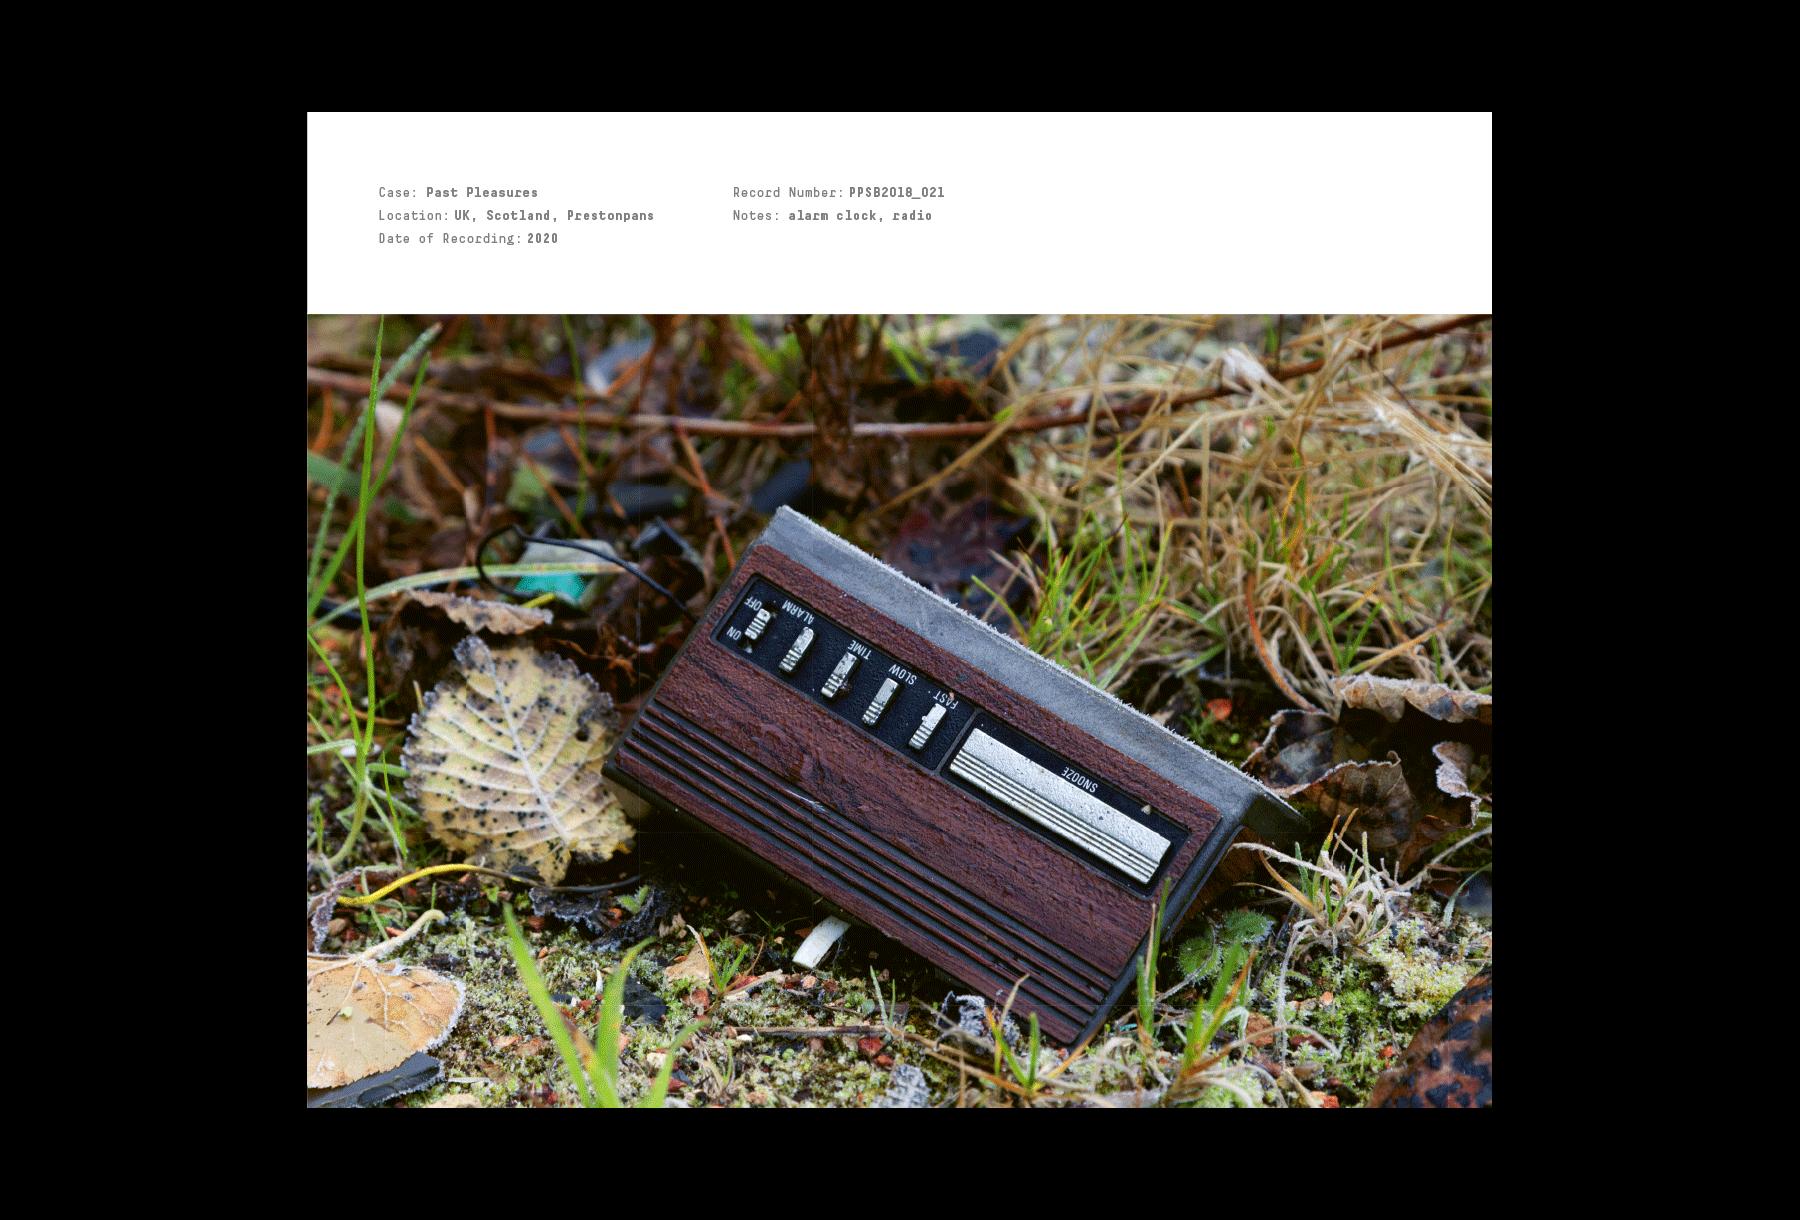 Radio decaying on the ground